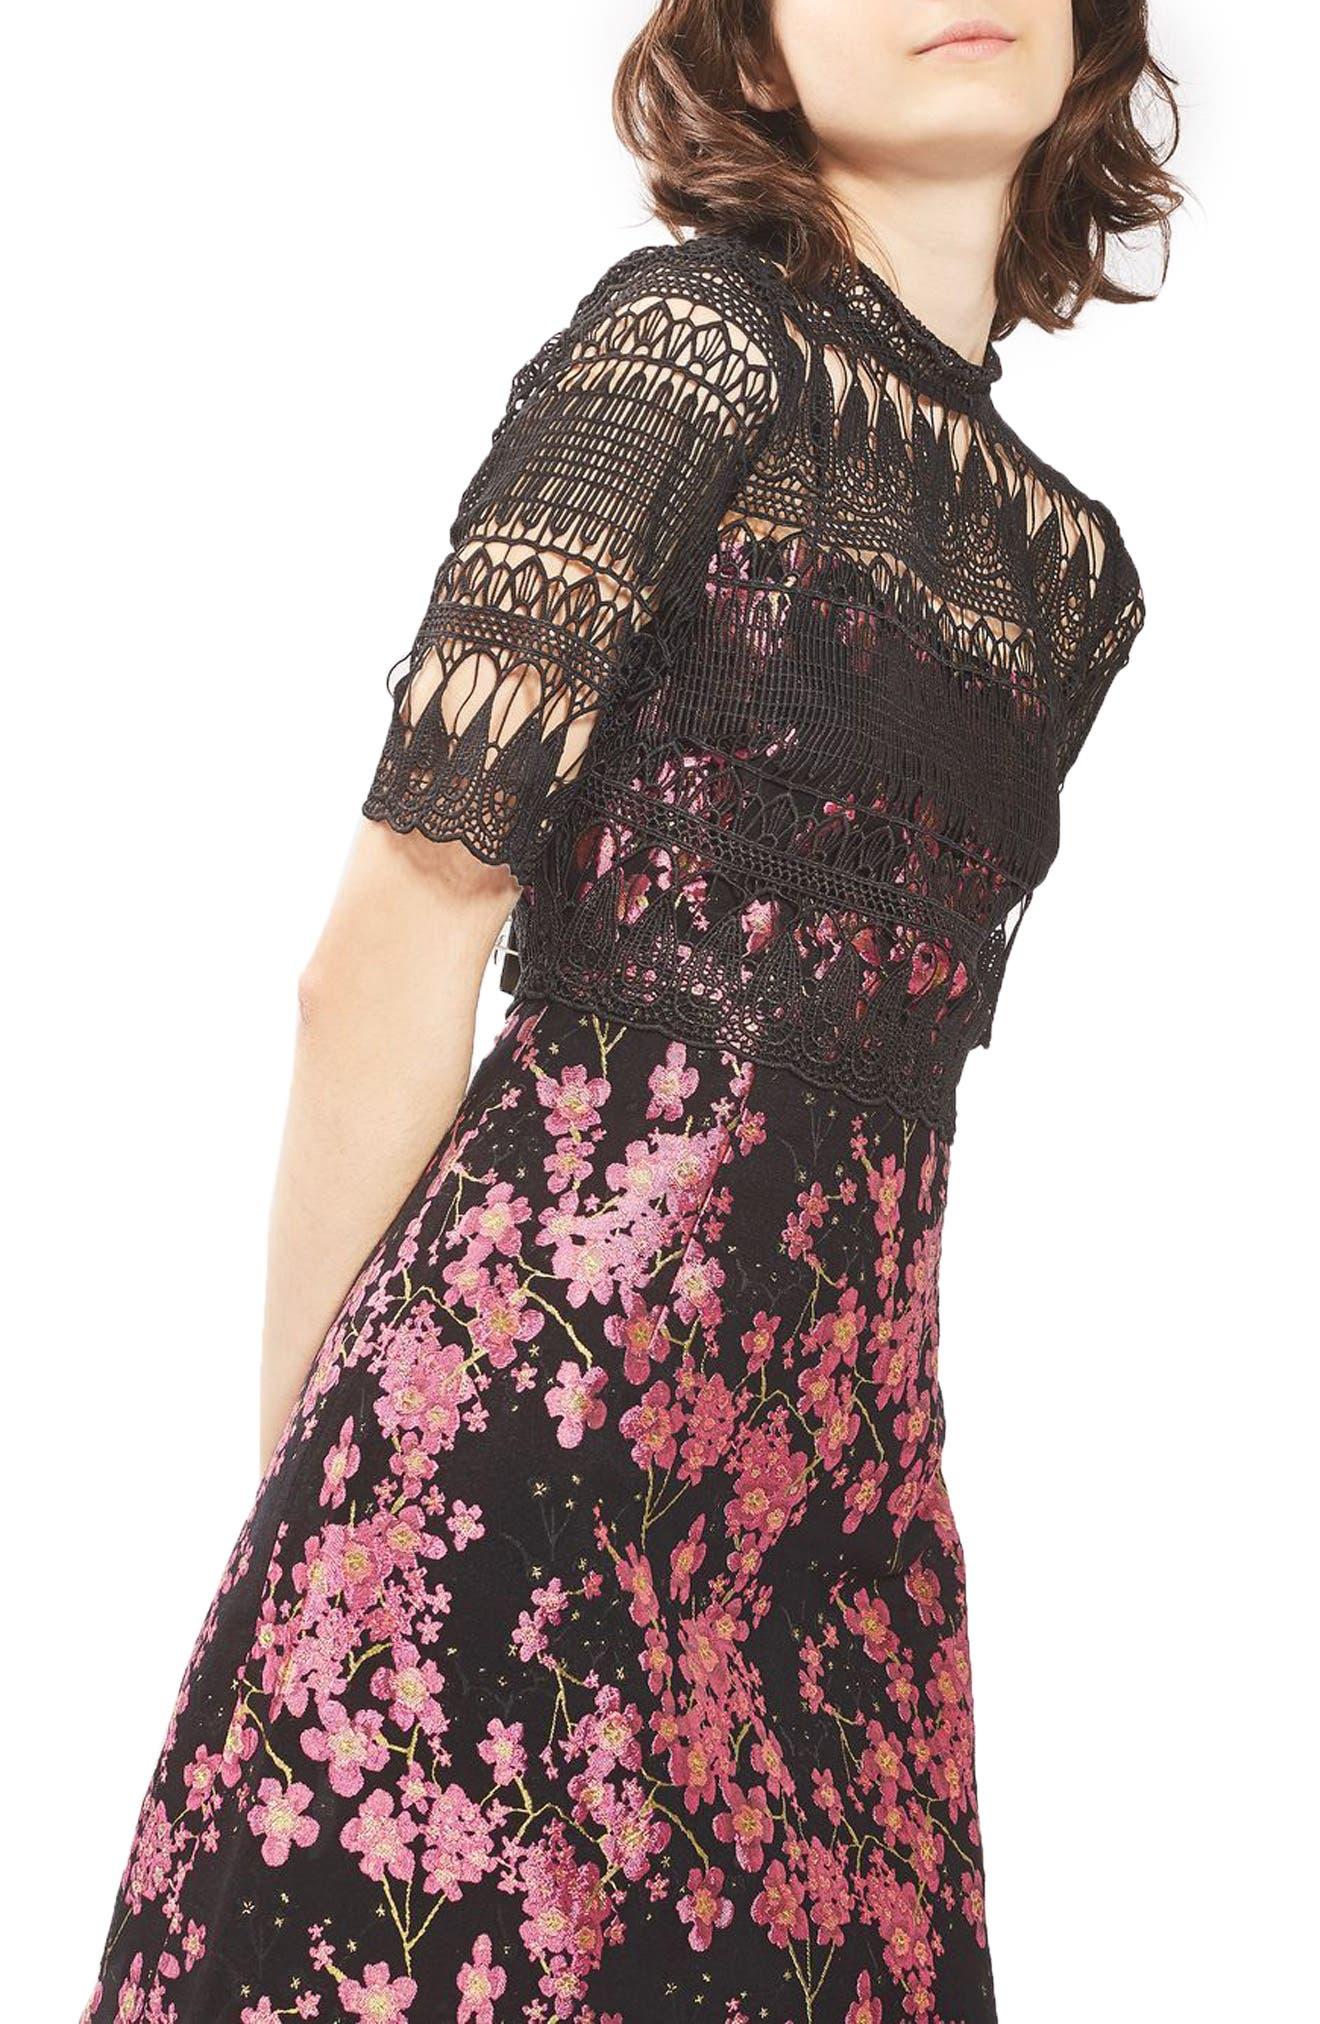 Alternate Image 1 Selected - Topshop Lace & Jacquard Dress